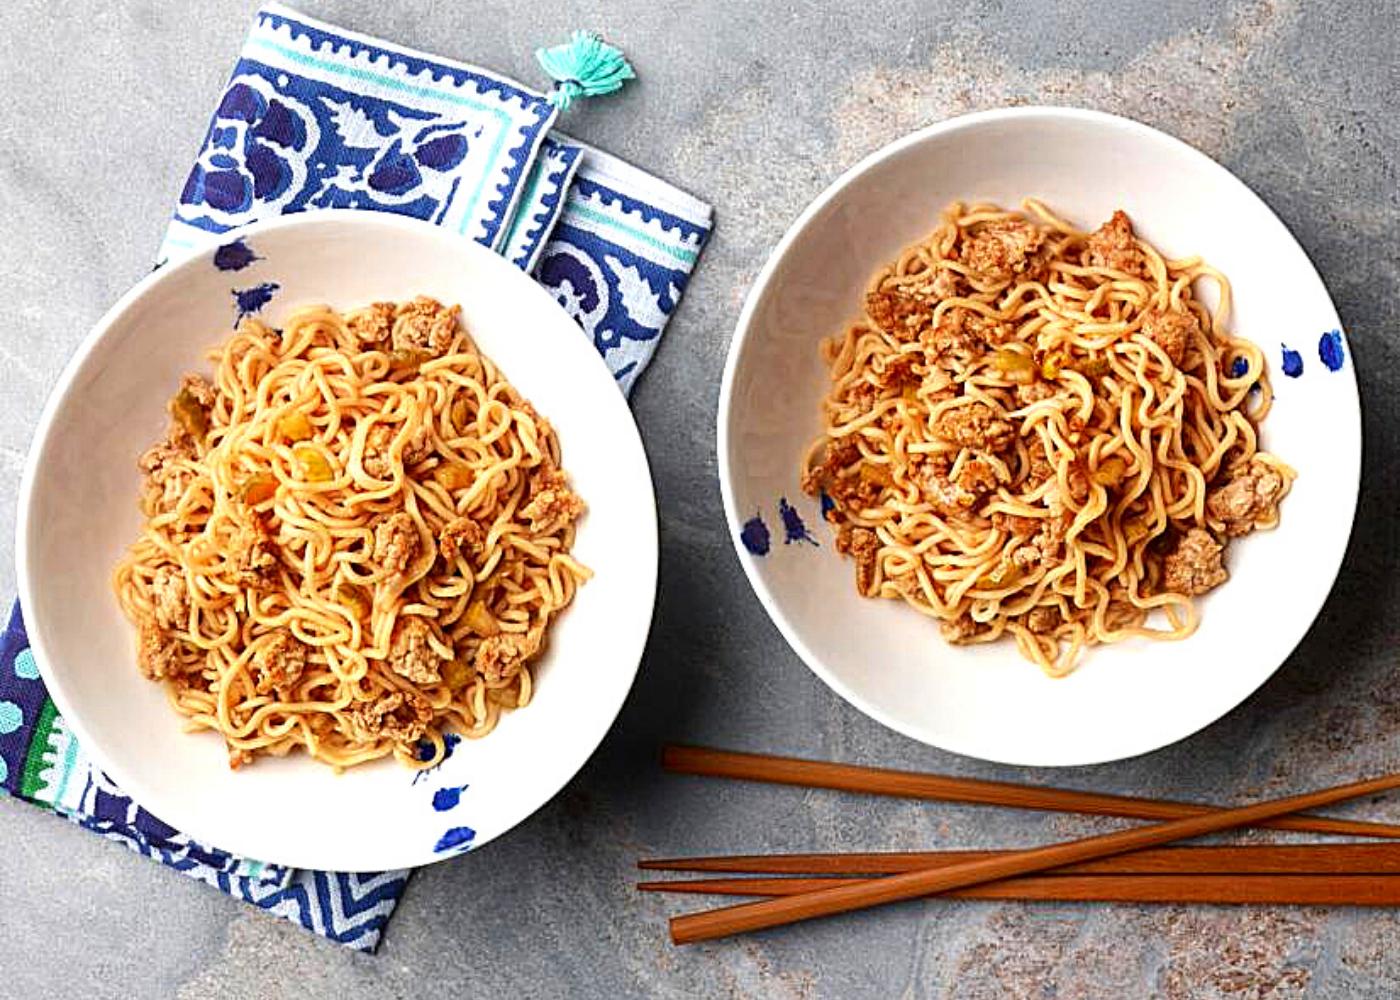 Best upgraded instant noodle recipes: Dan Dan noodles